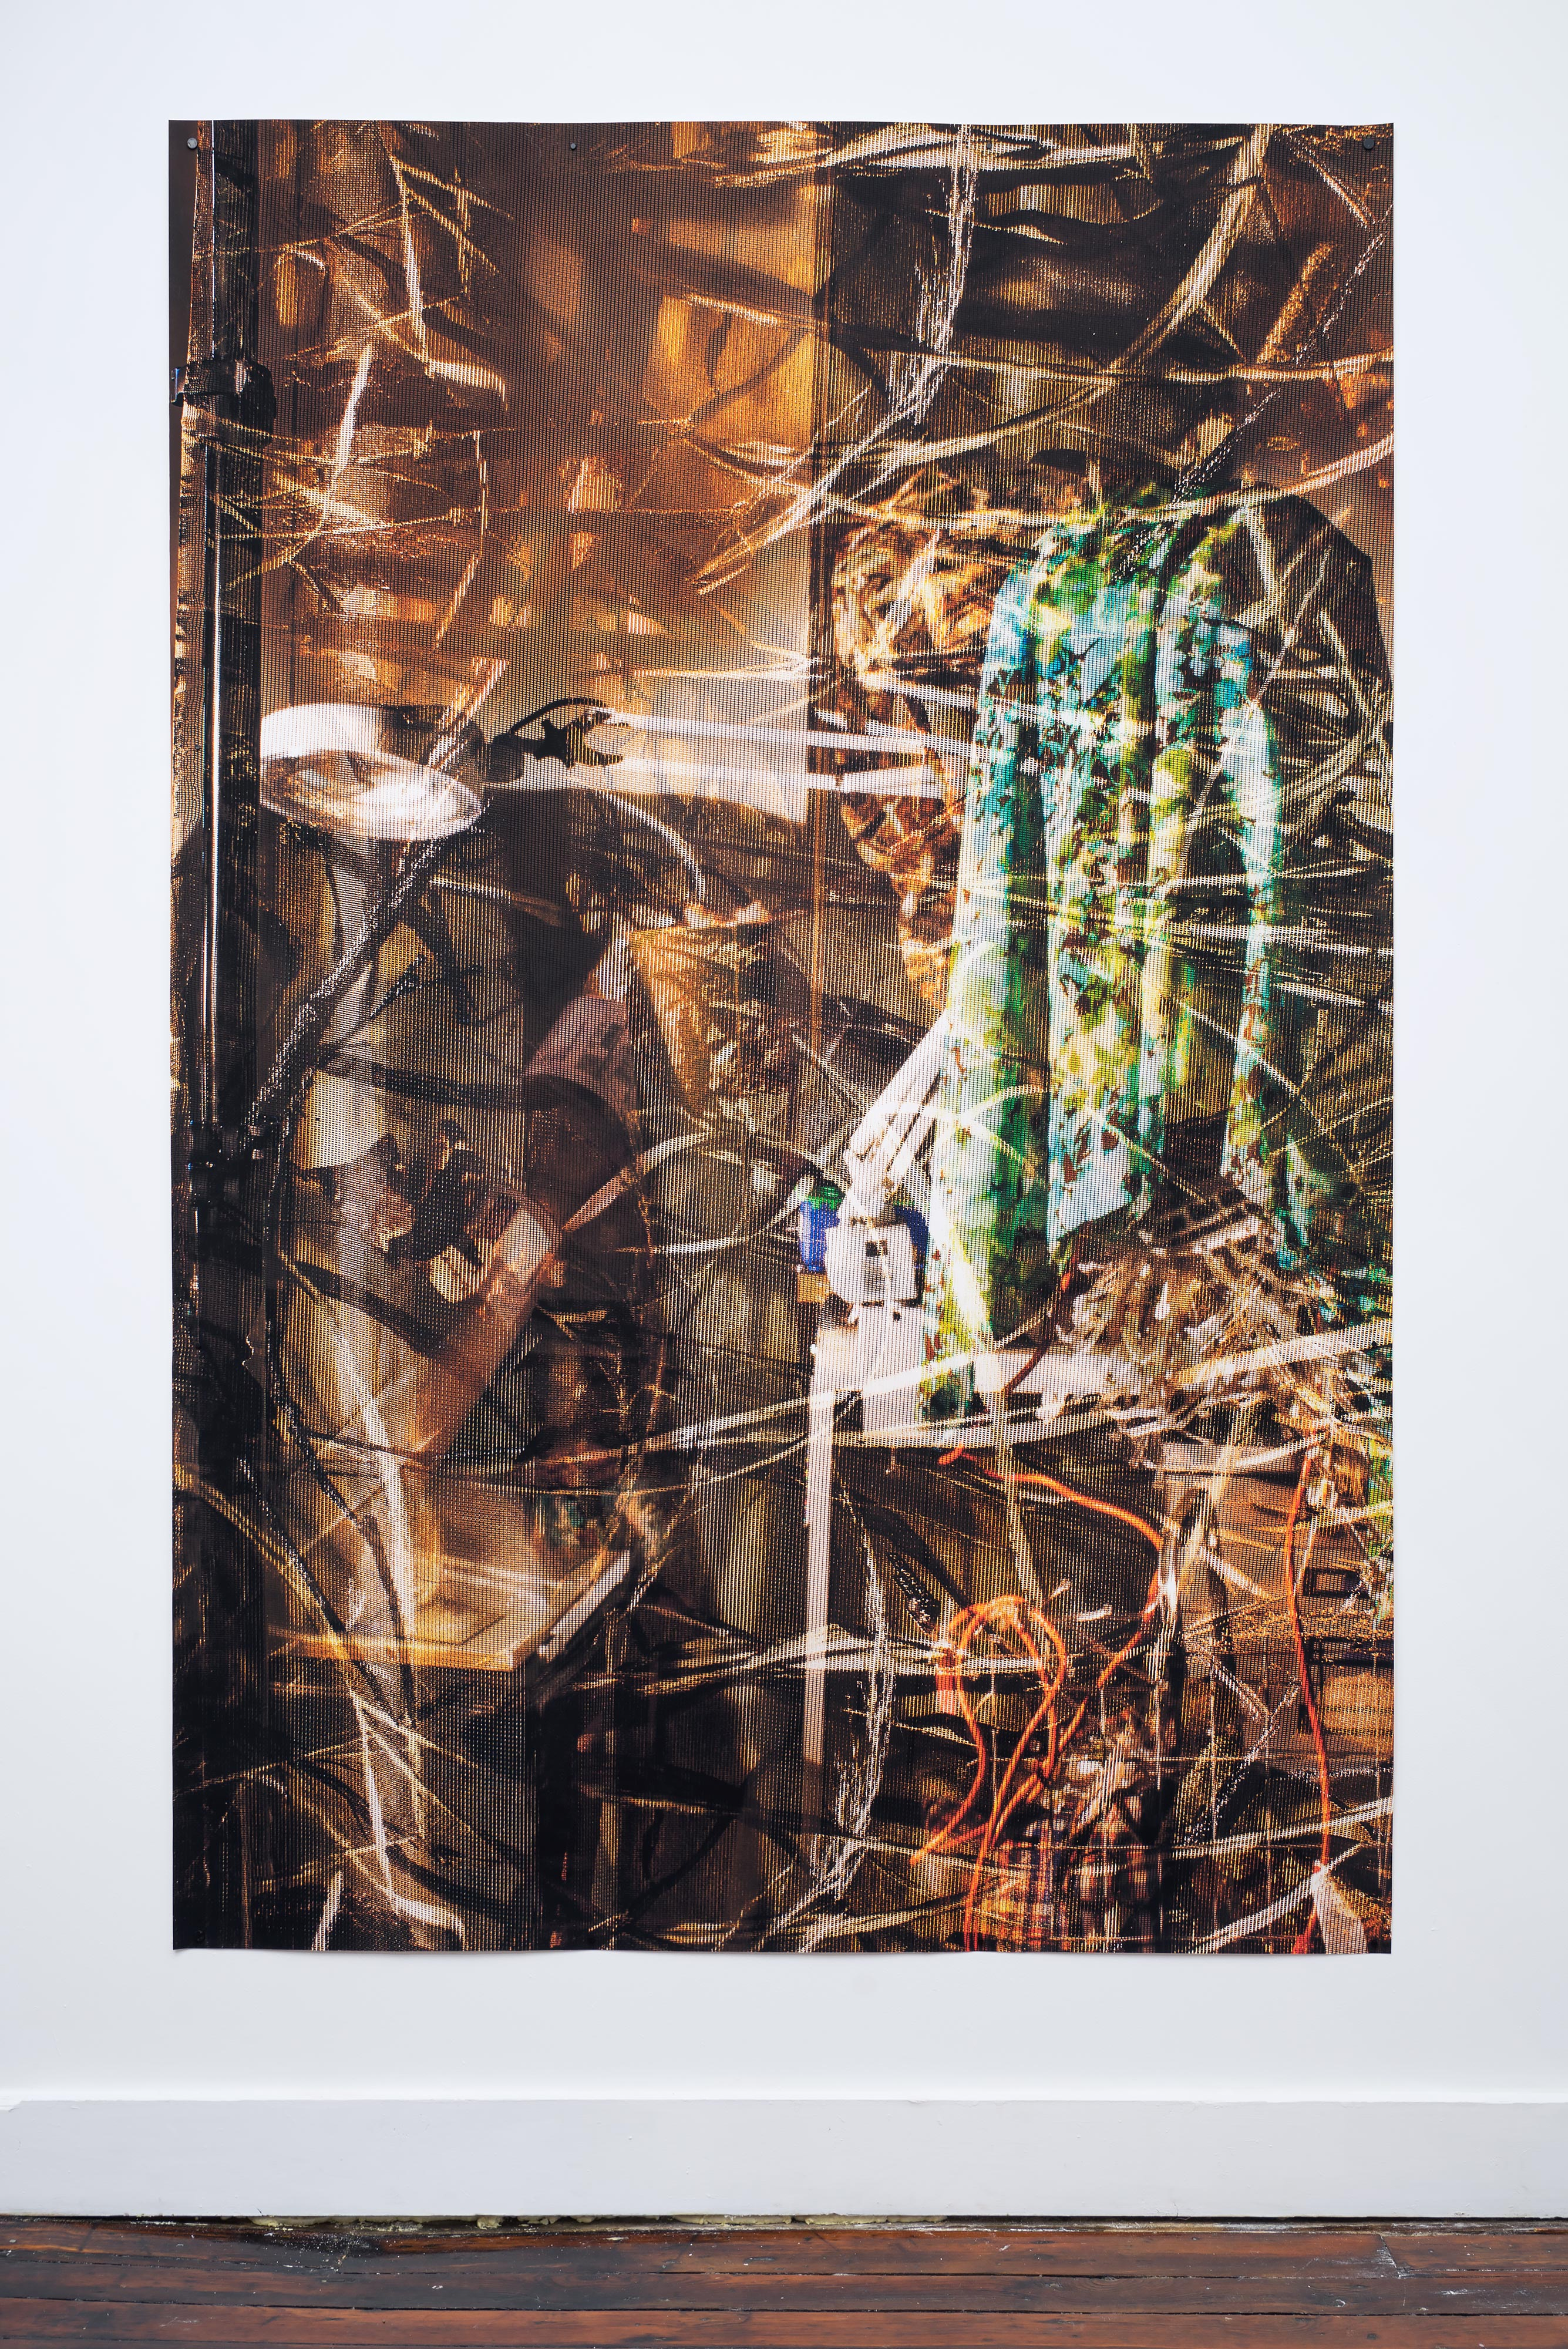 ELLEN BROOKS<br>Untitled (magnifying lamp)<br>2015<br>Digital pigment print<br>86 x 58 in (218 x147 cm)